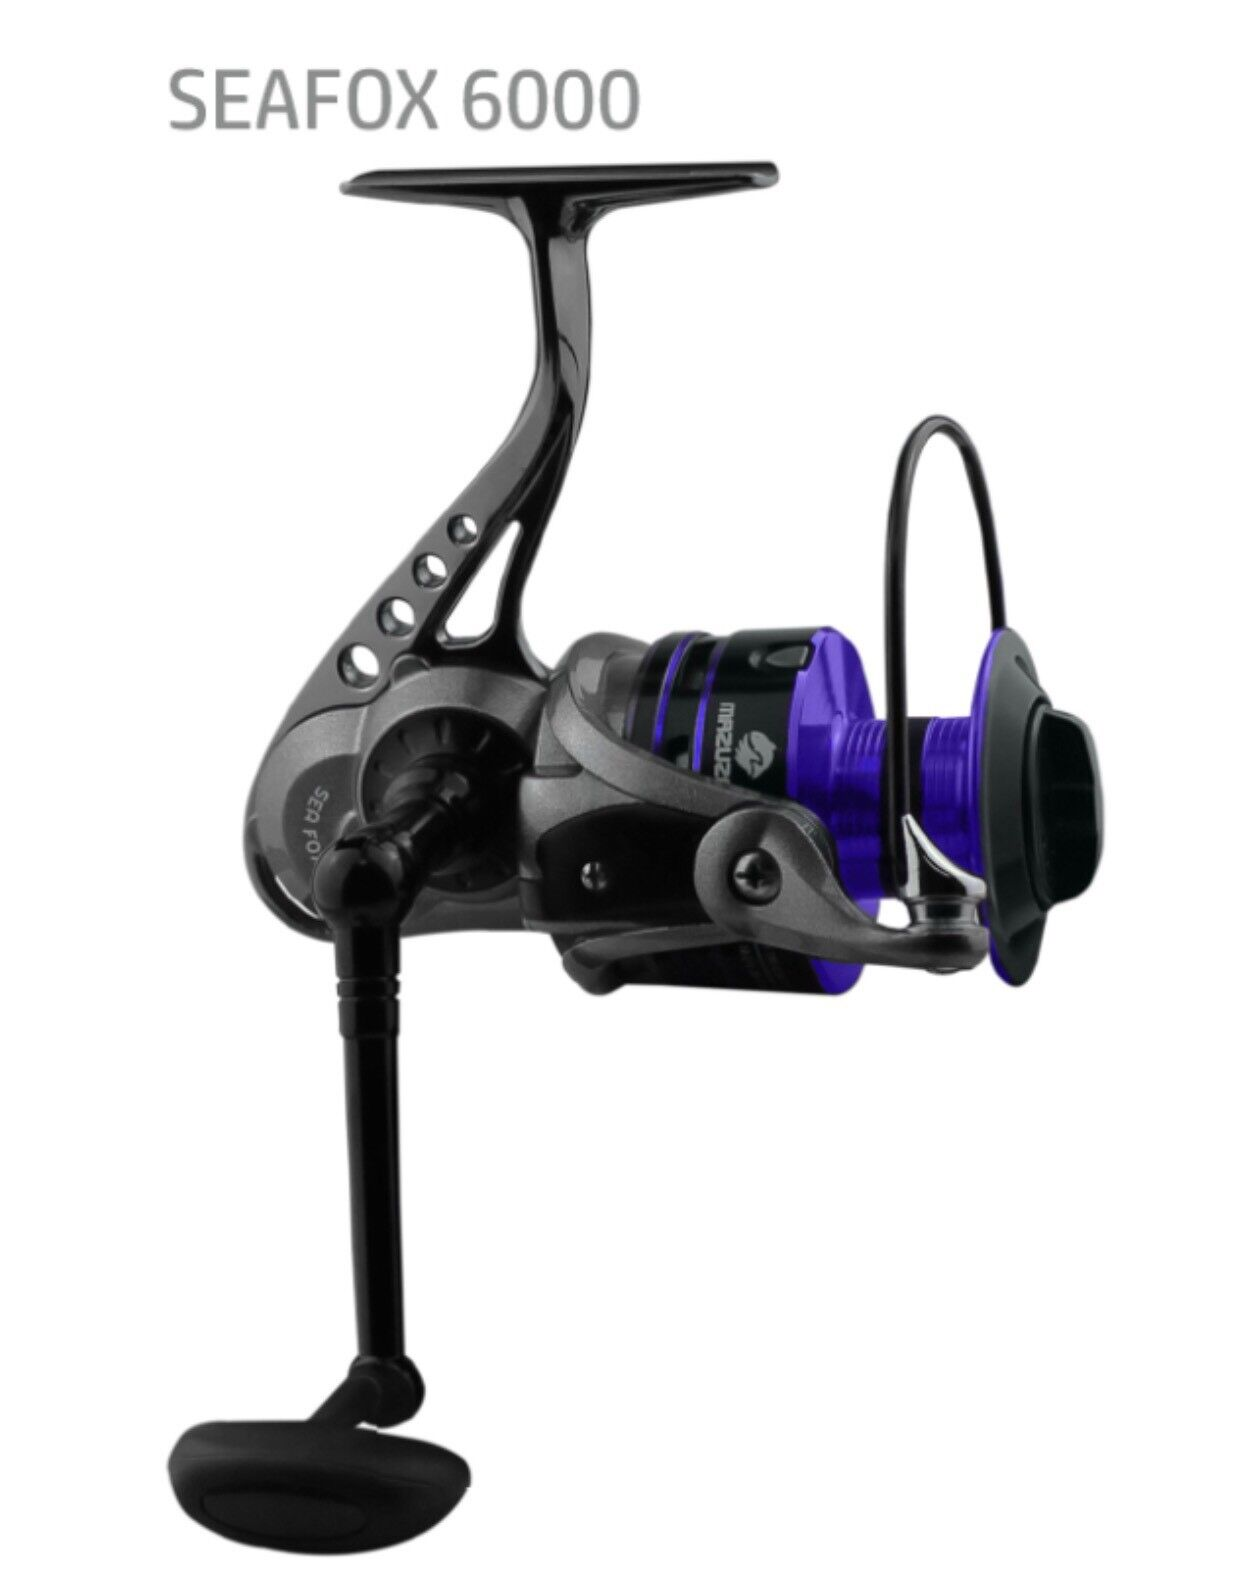 SEA FOX 6000 Fishing Reel Bait Spining Fishing  Reel BR Bite N Run Freespool  fair prices